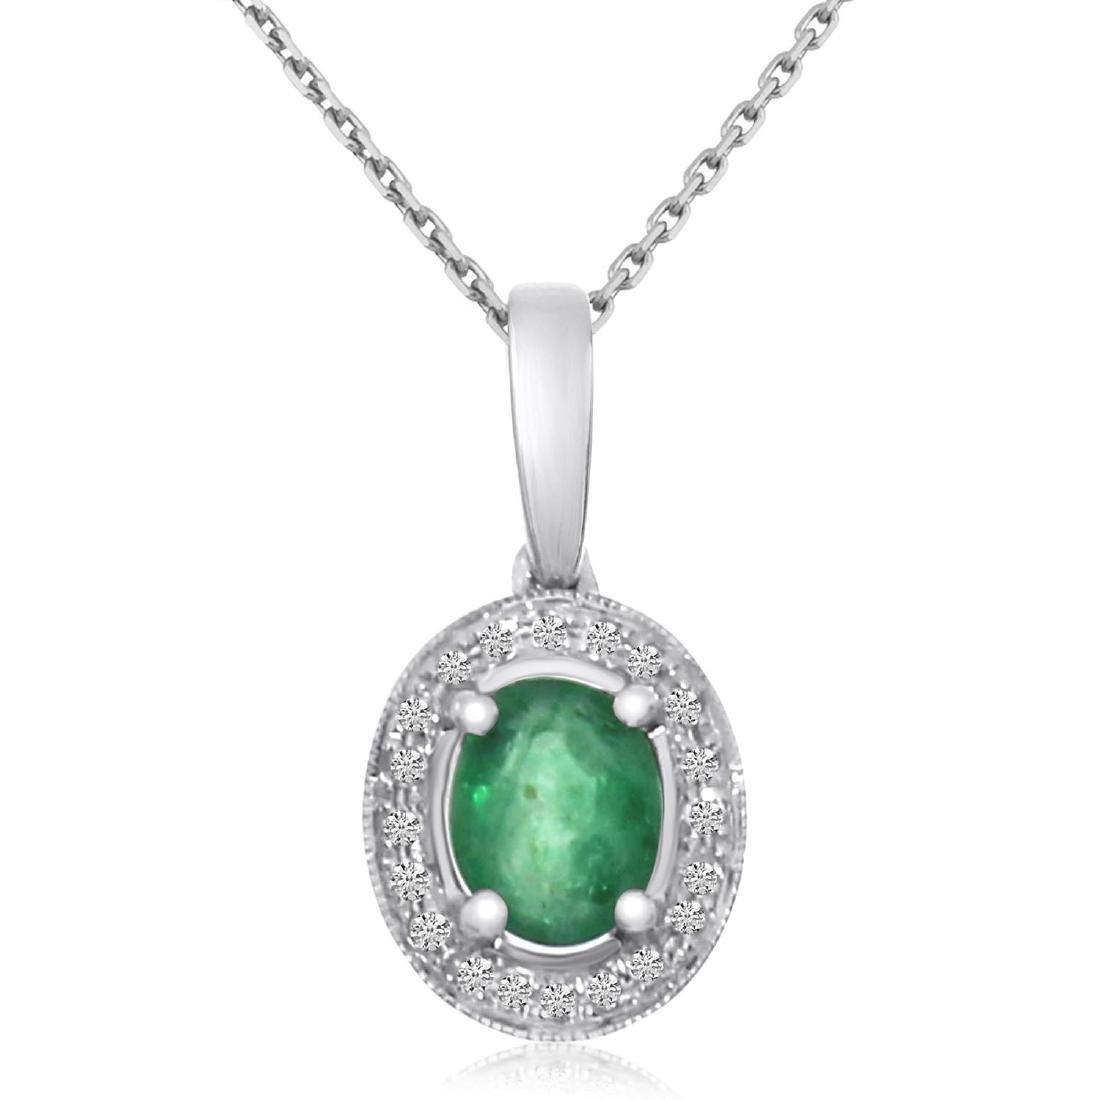 Certified 14k White Gold Oval Emerald and Diamond Penda